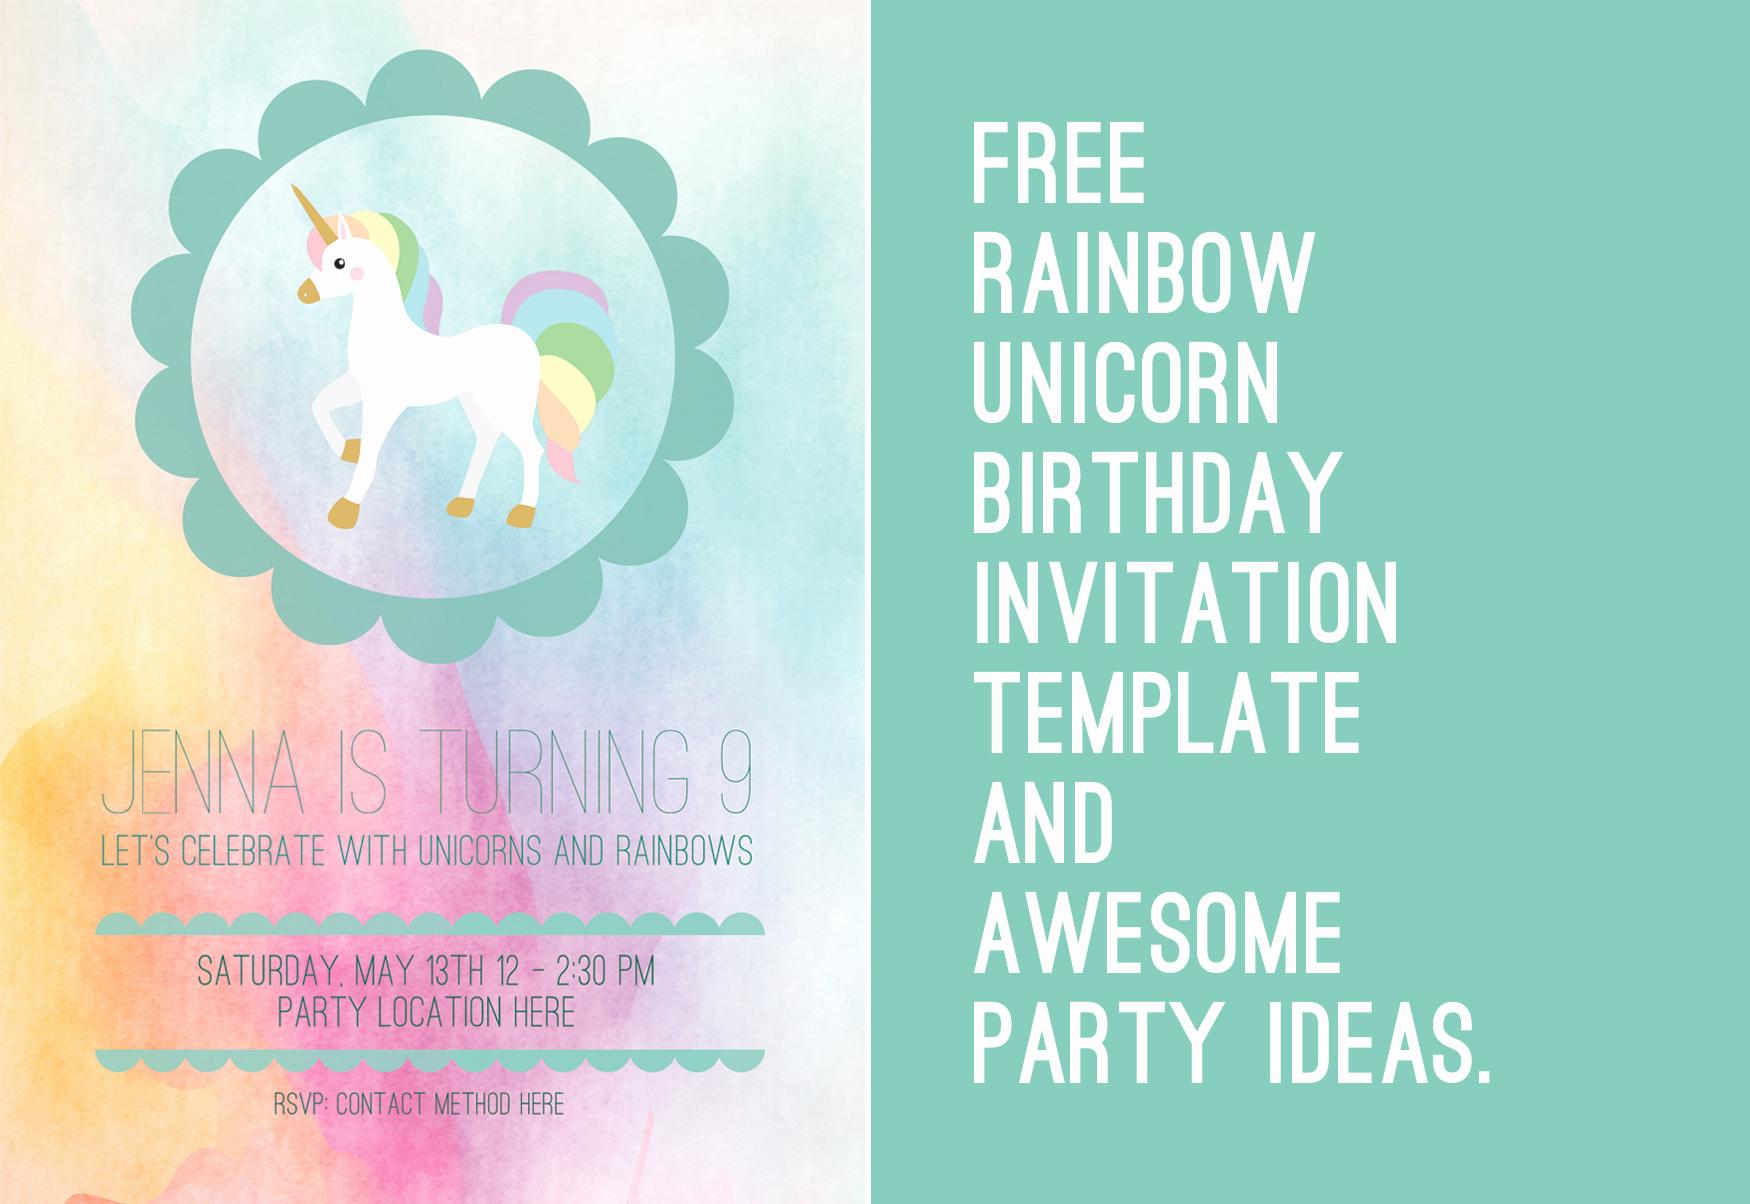 Unicorn Invitation Template Free Inspirational A Unicorn and Rainbow Birthday